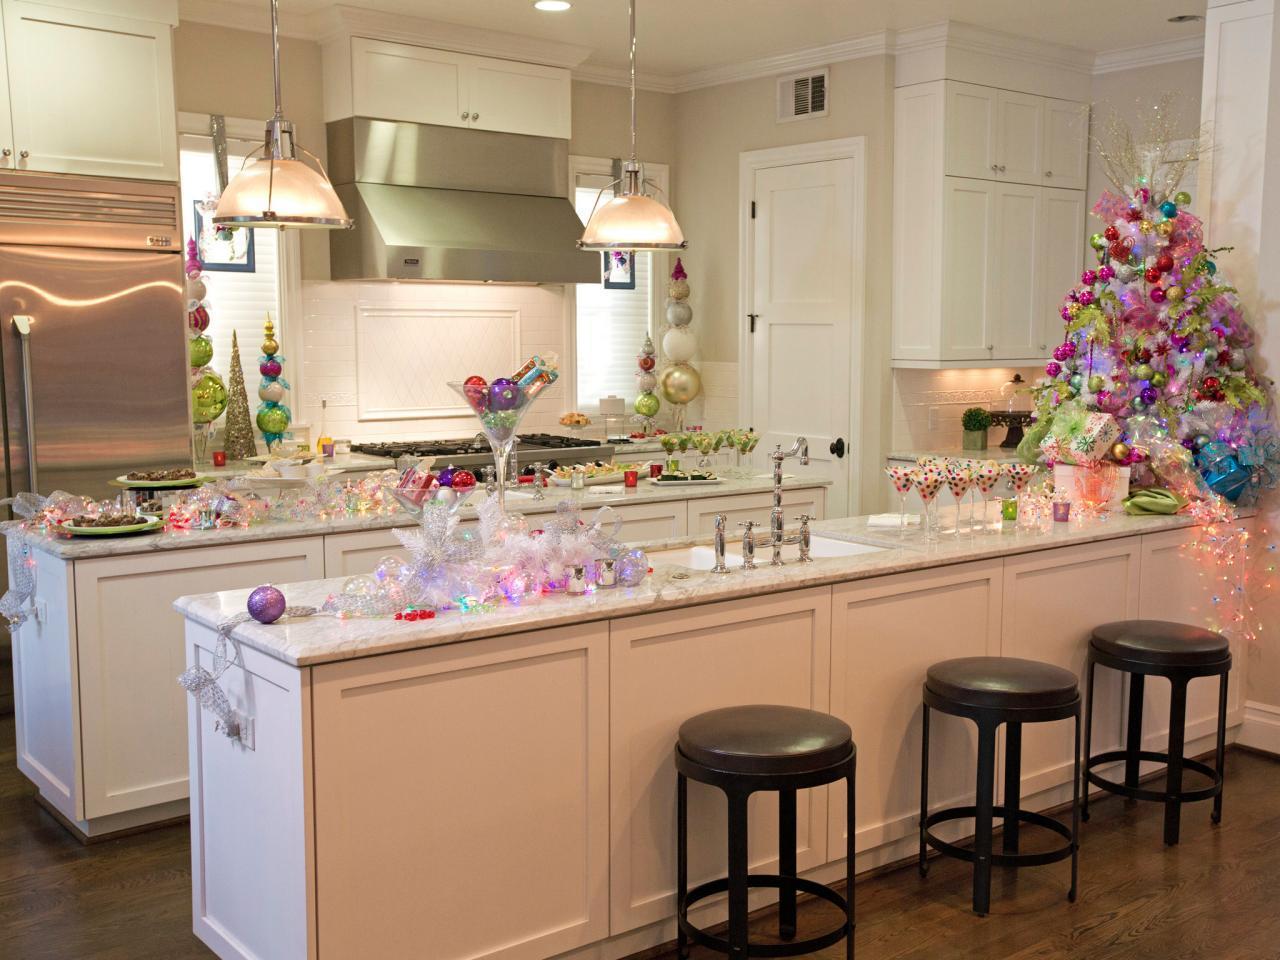 8 Perfectly Decorated Holiday Kitchens - Shakeology